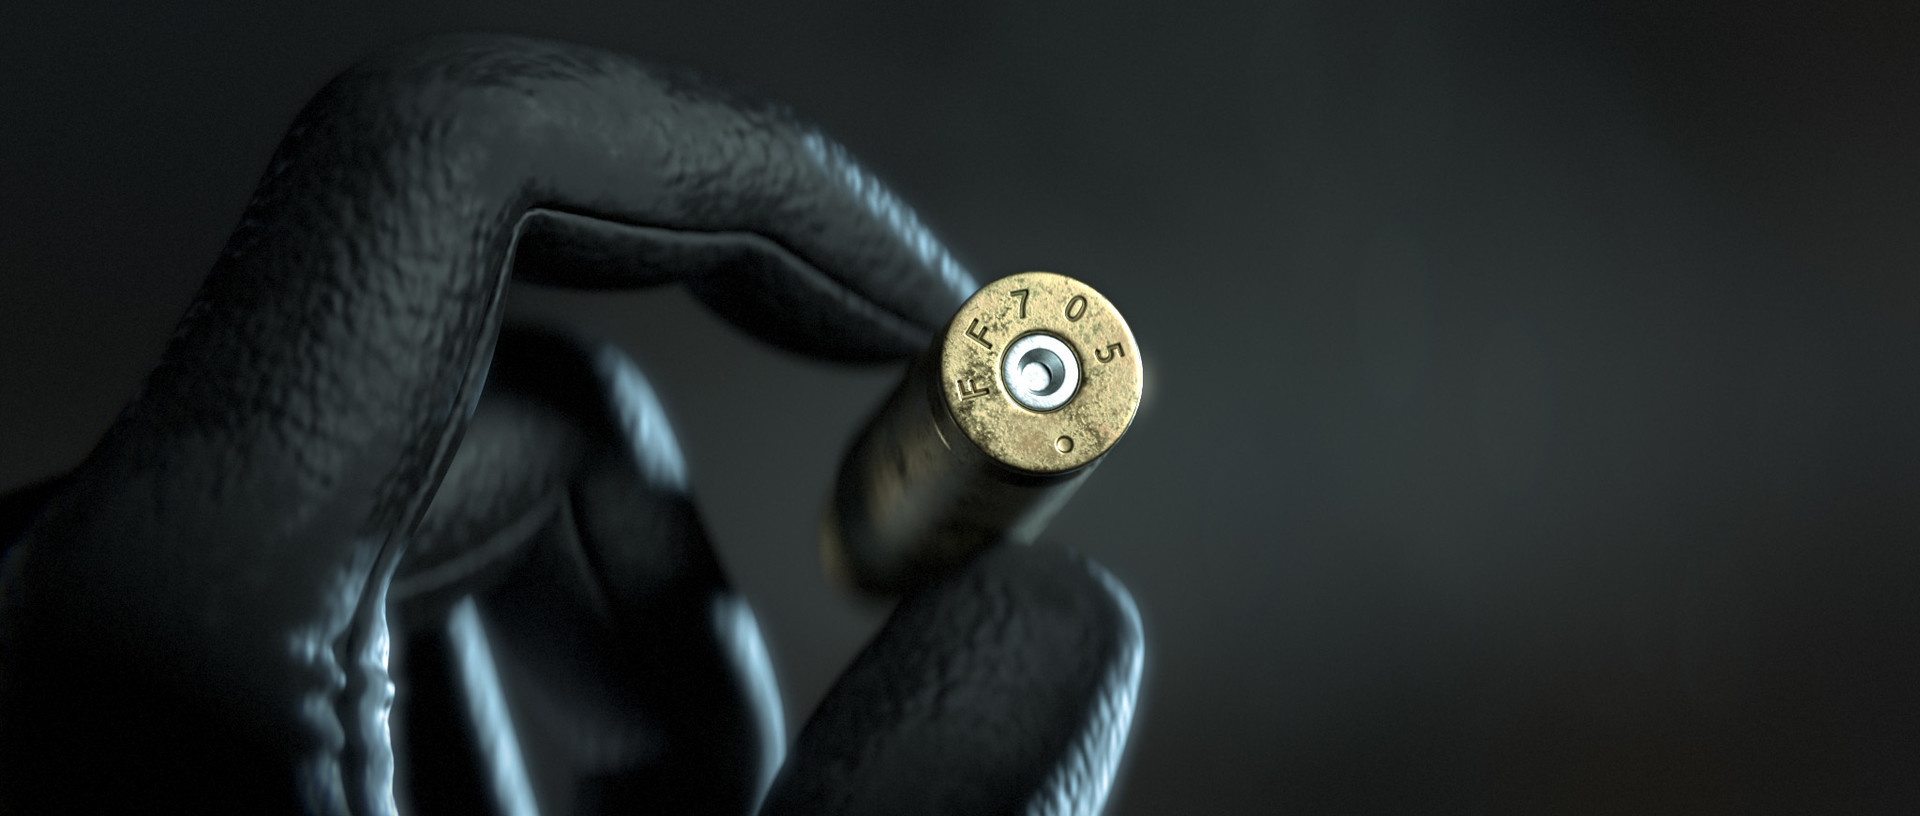 Shawn wang bulletshell shot 00300 comp v002 cover